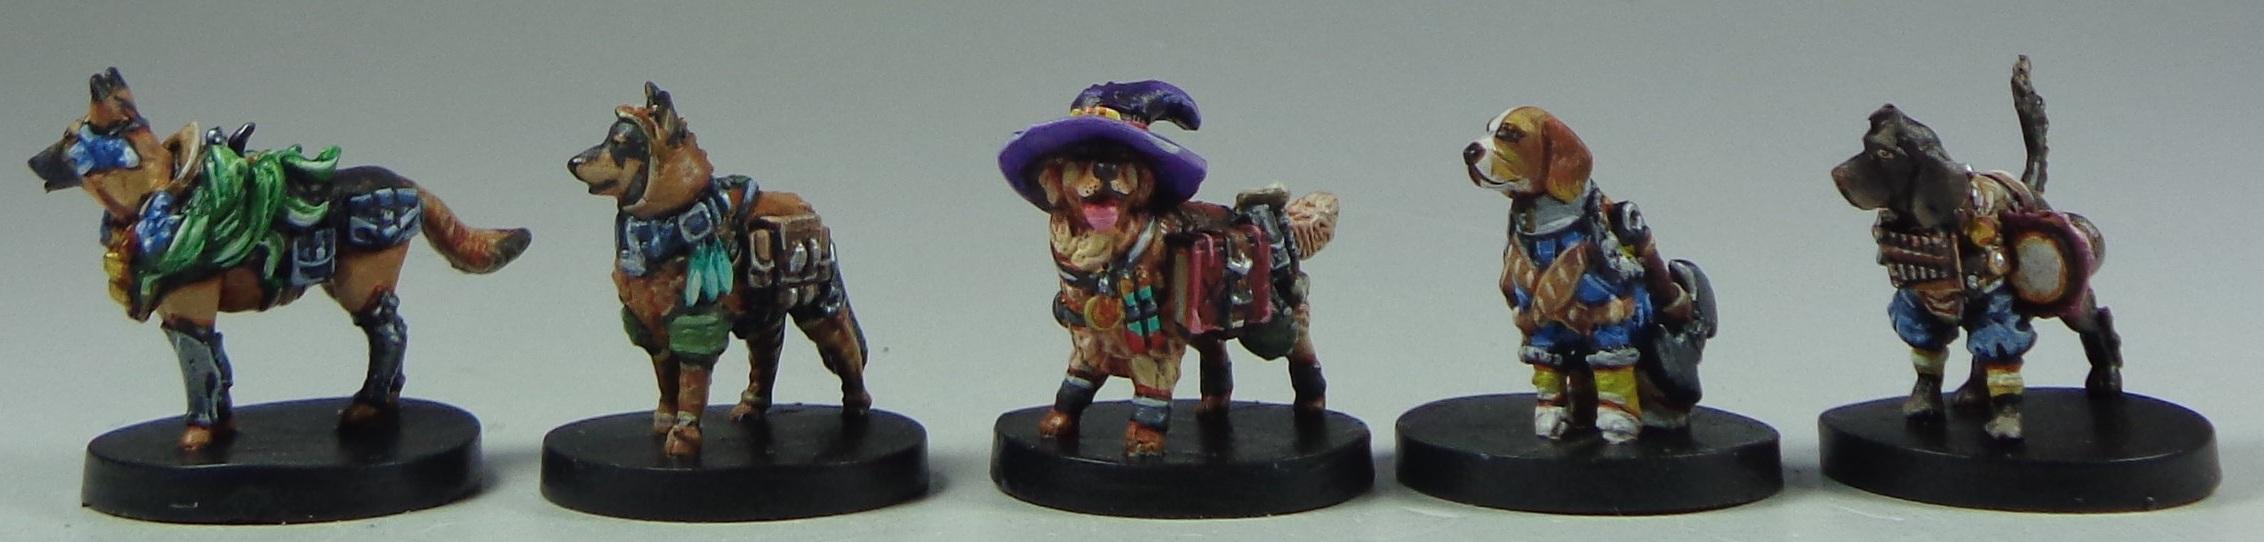 Paintedfigs+Miniature+Painting+Service+KL+Dungeons+%26+Doggies+%285%29.jpg